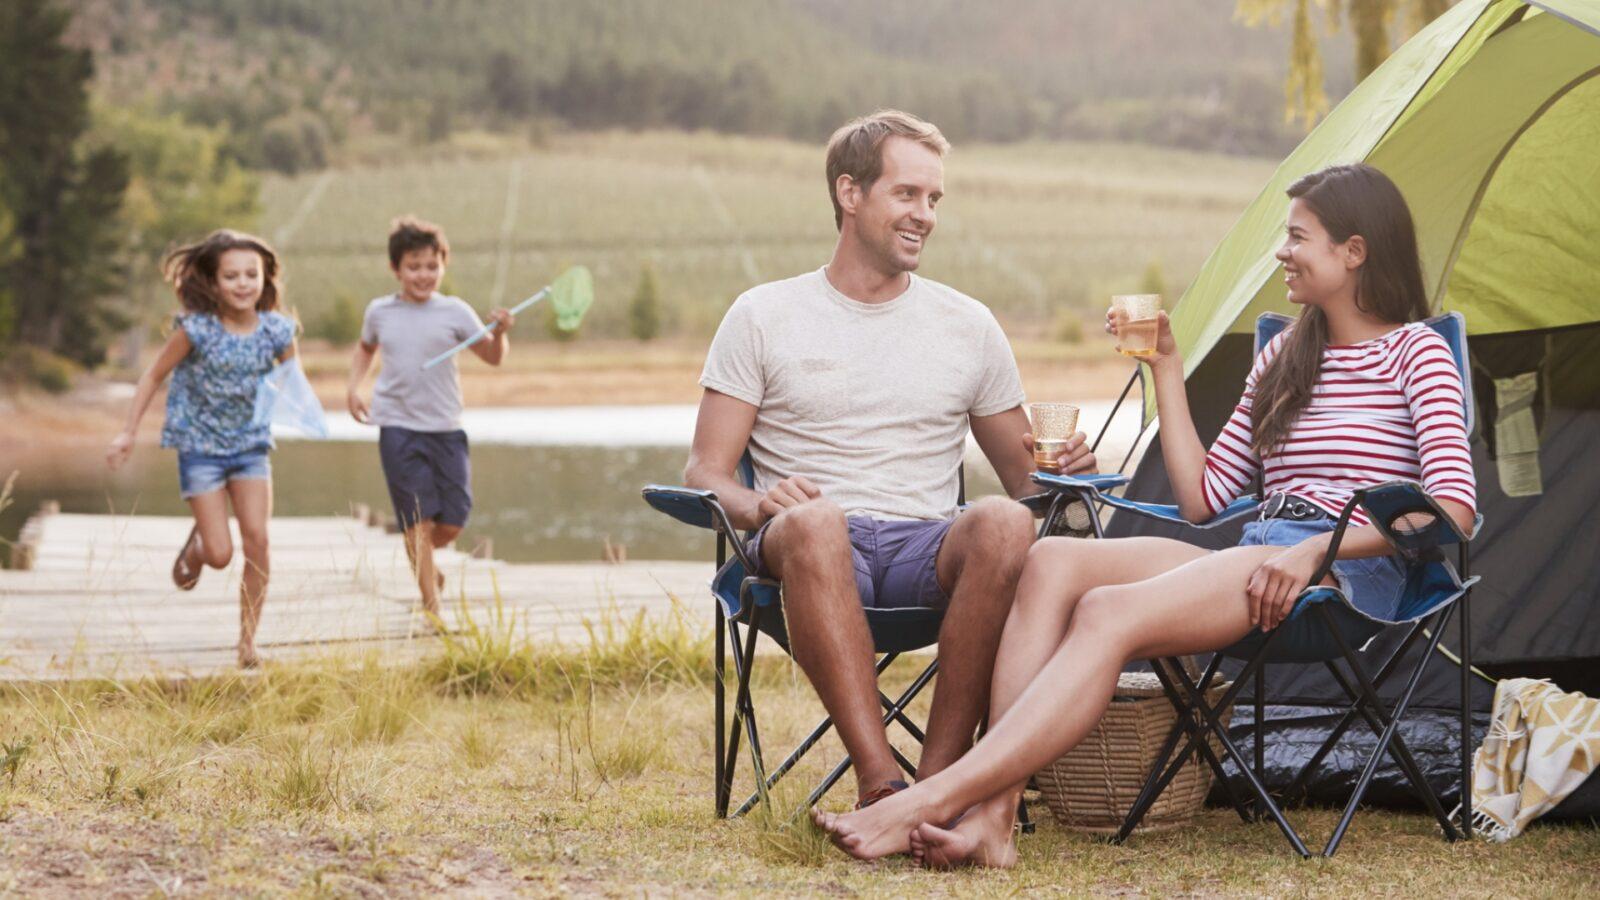 hebergement-camping-anjou-sport-nature